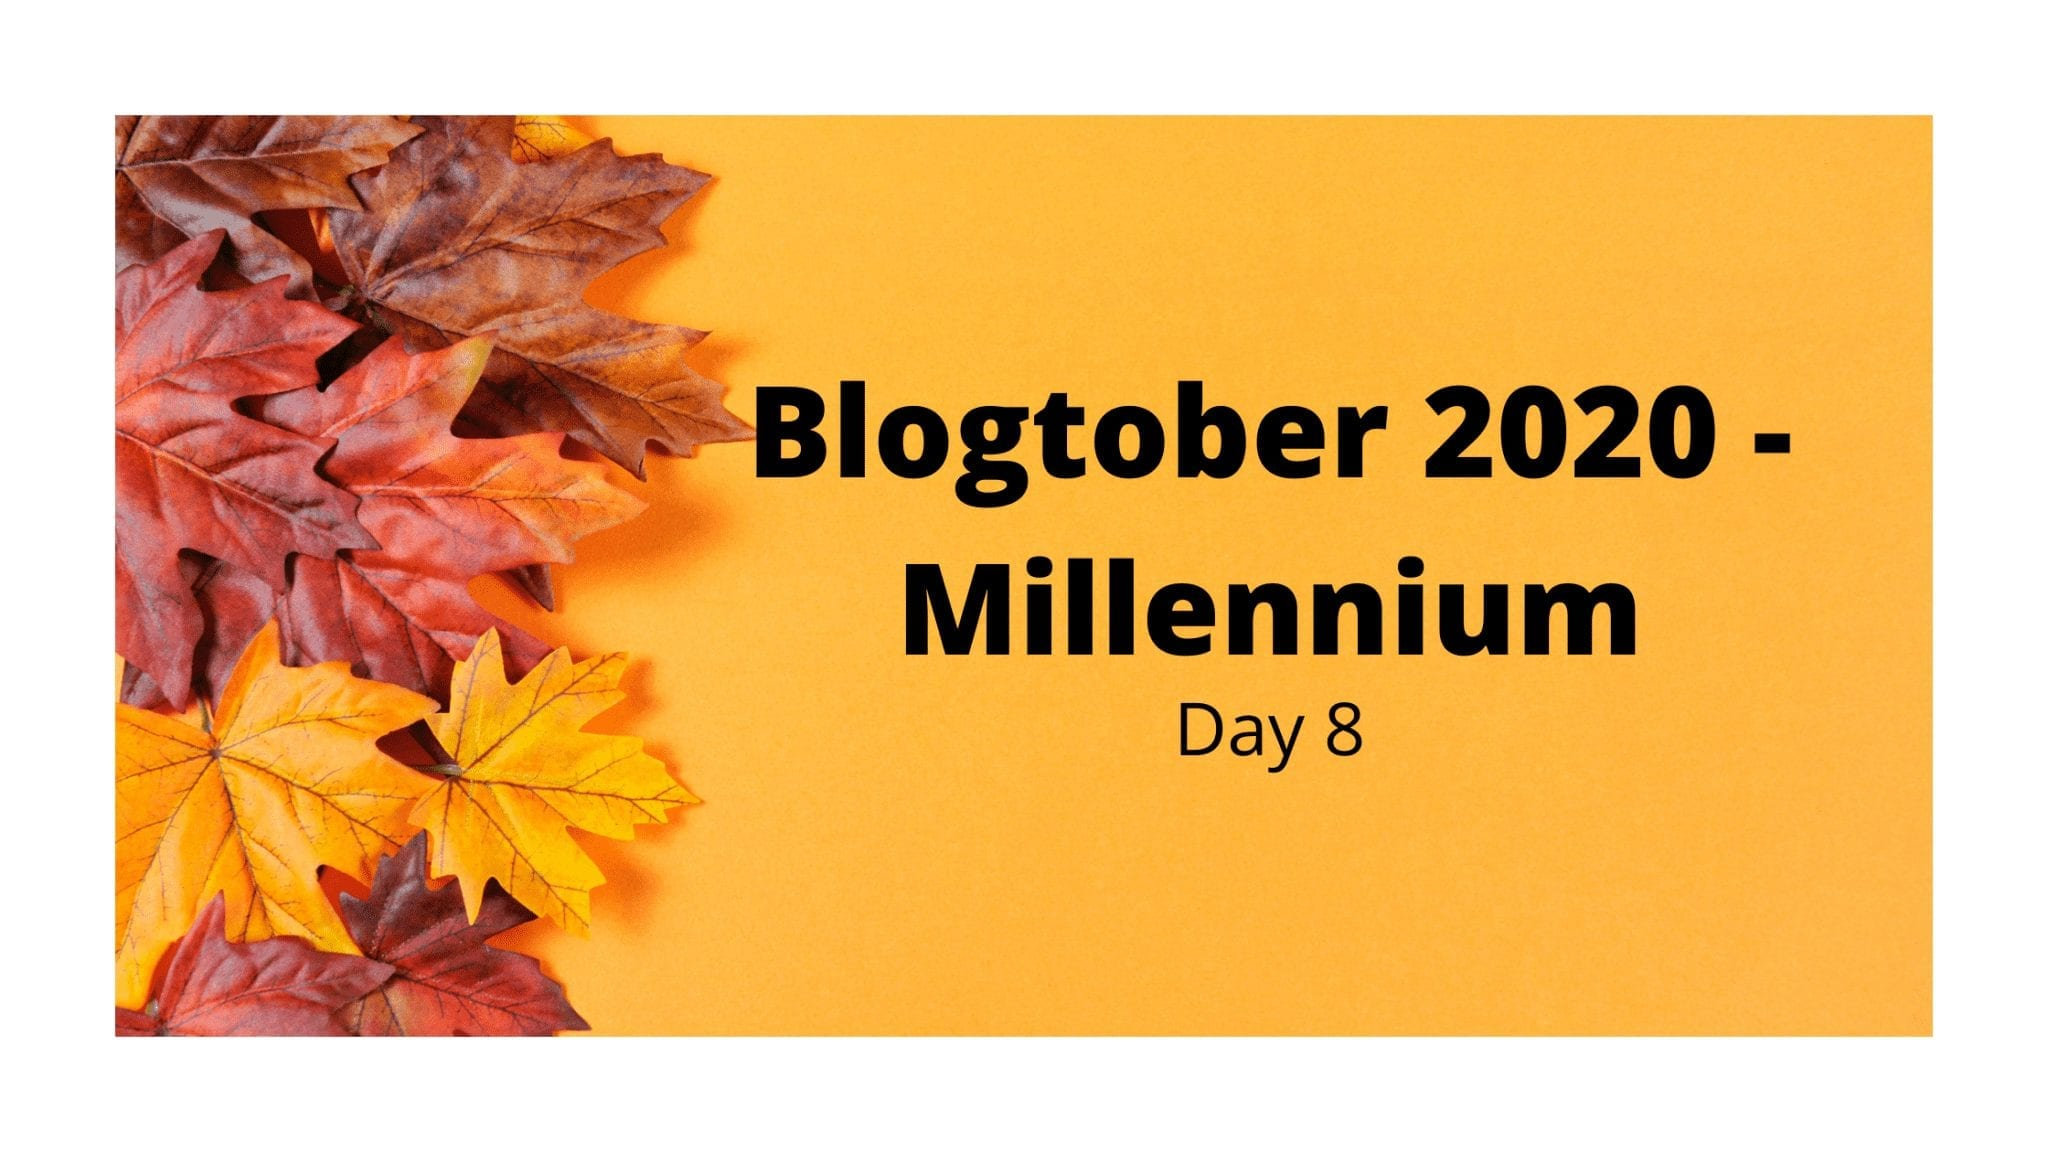 Blogtober 2020 - Millennium